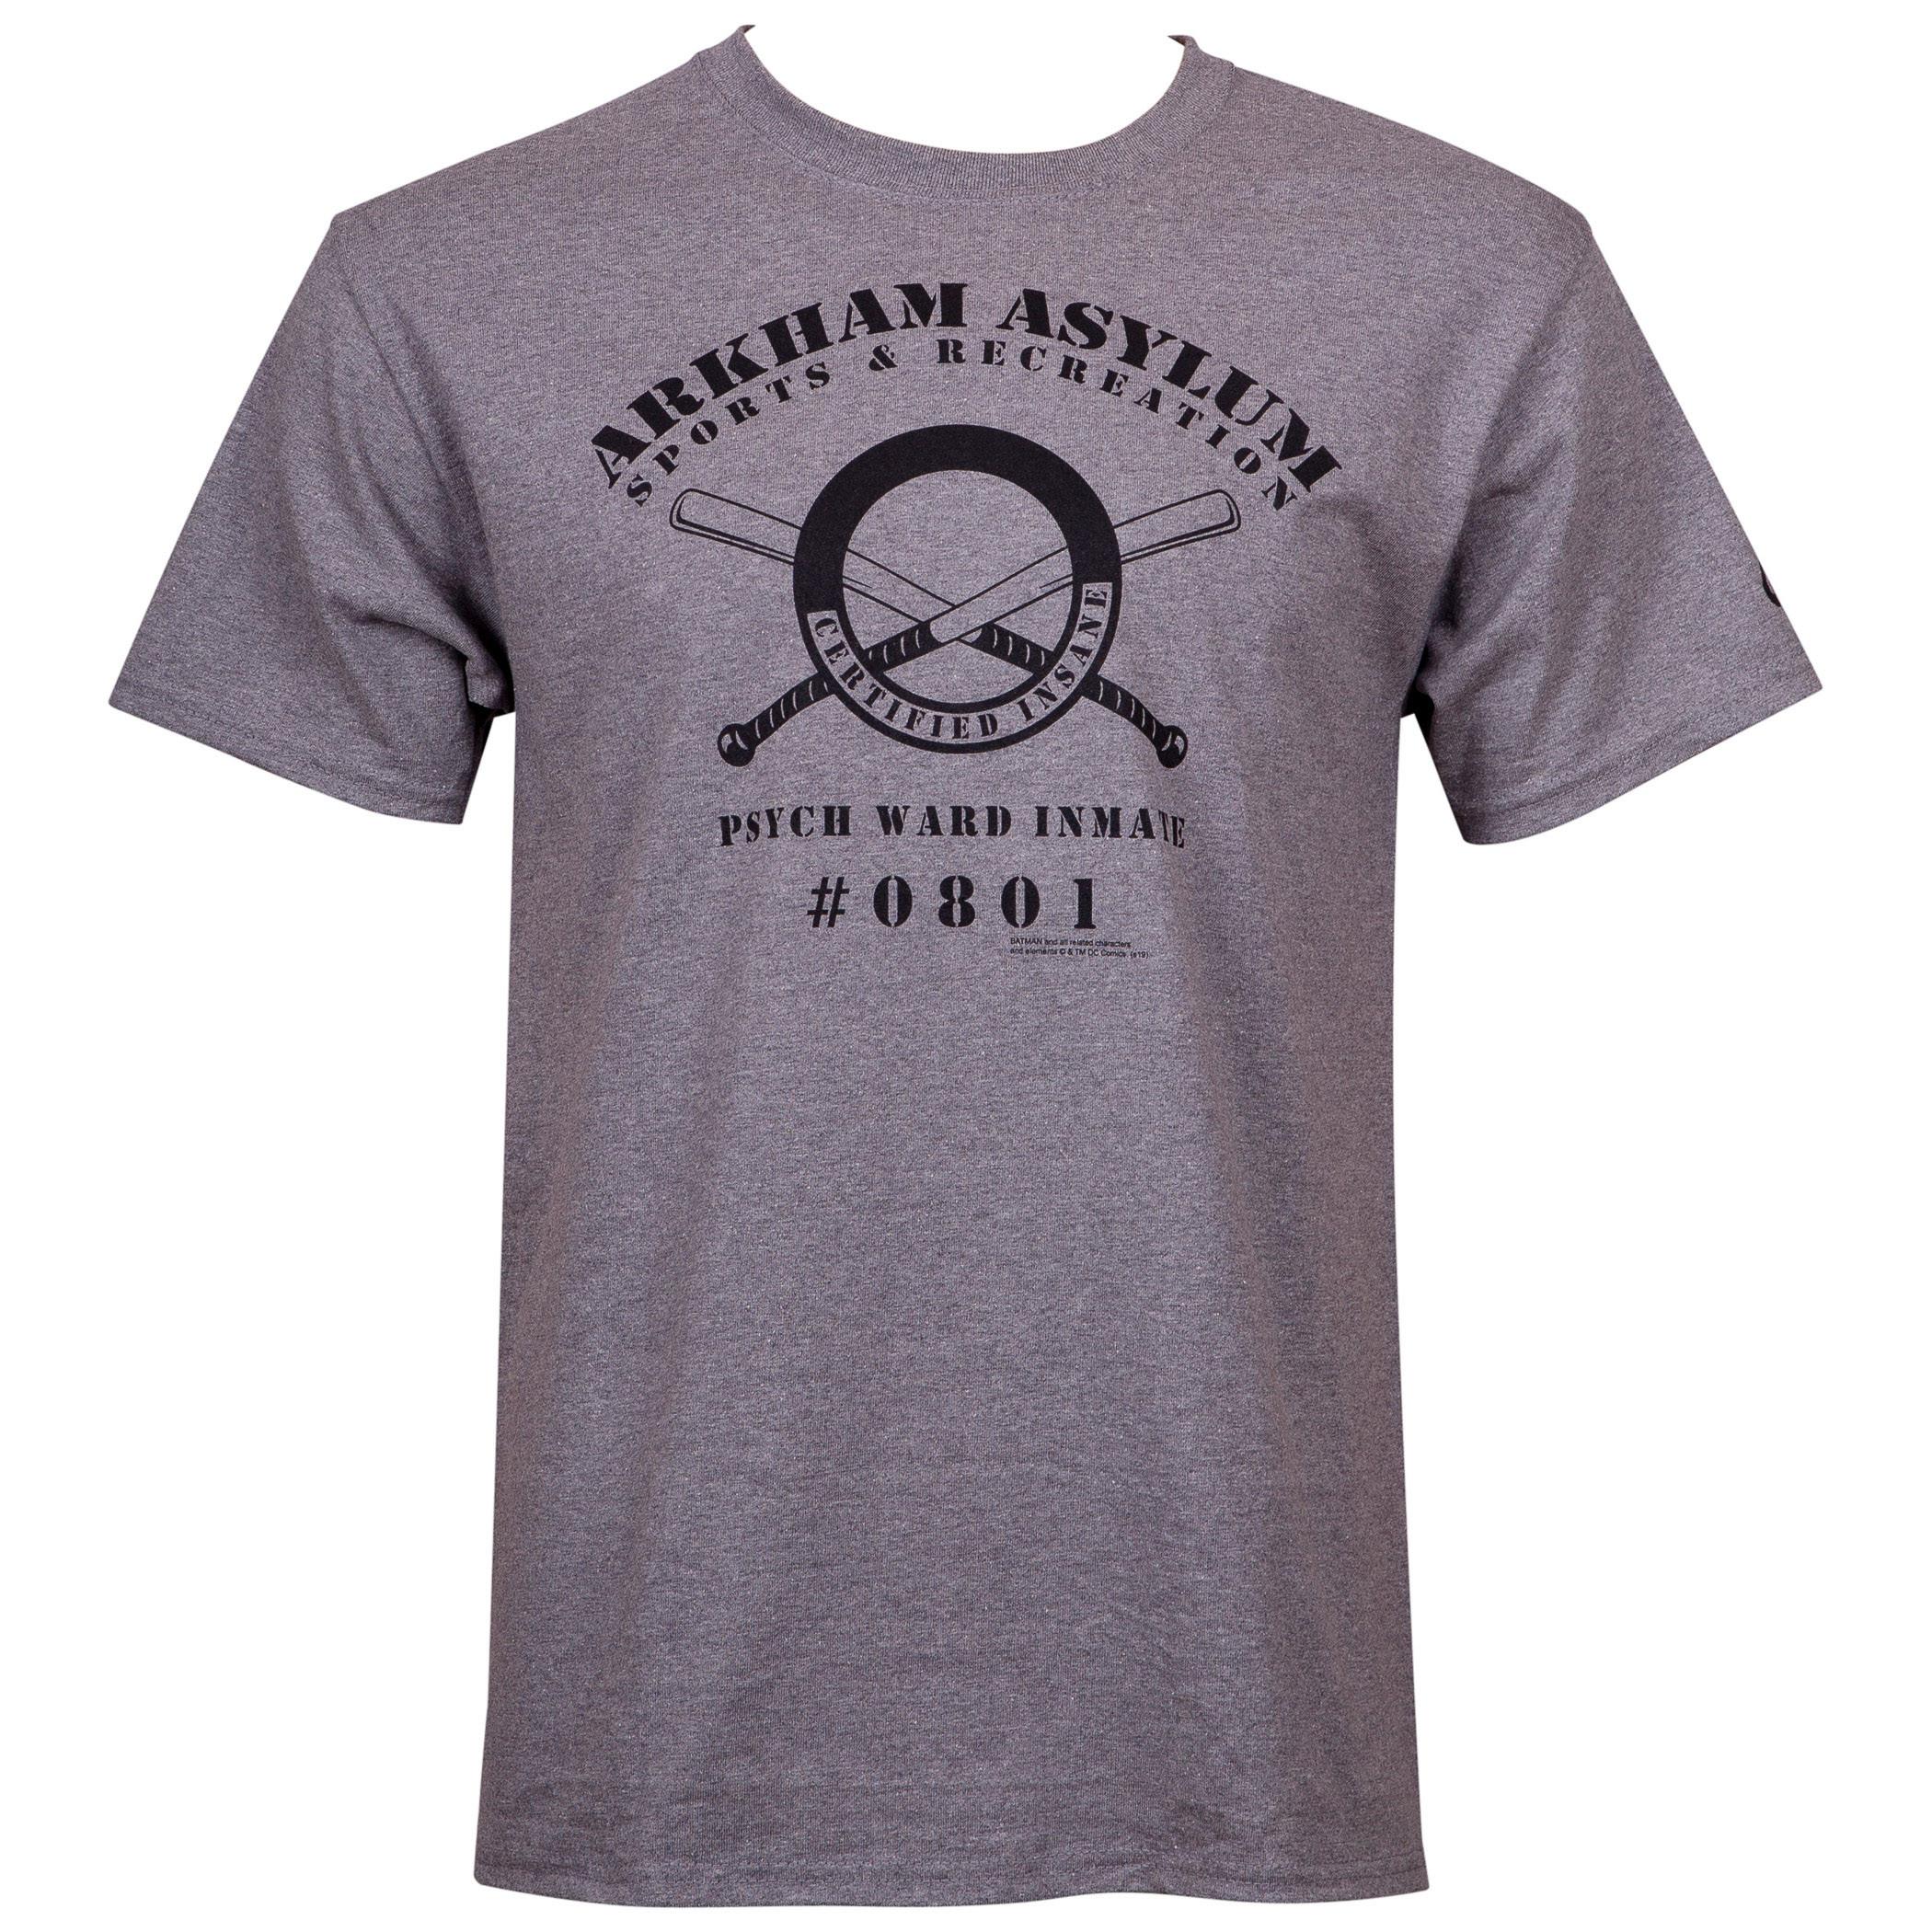 Arkham Asylum Parks and Recreation T-Shirt